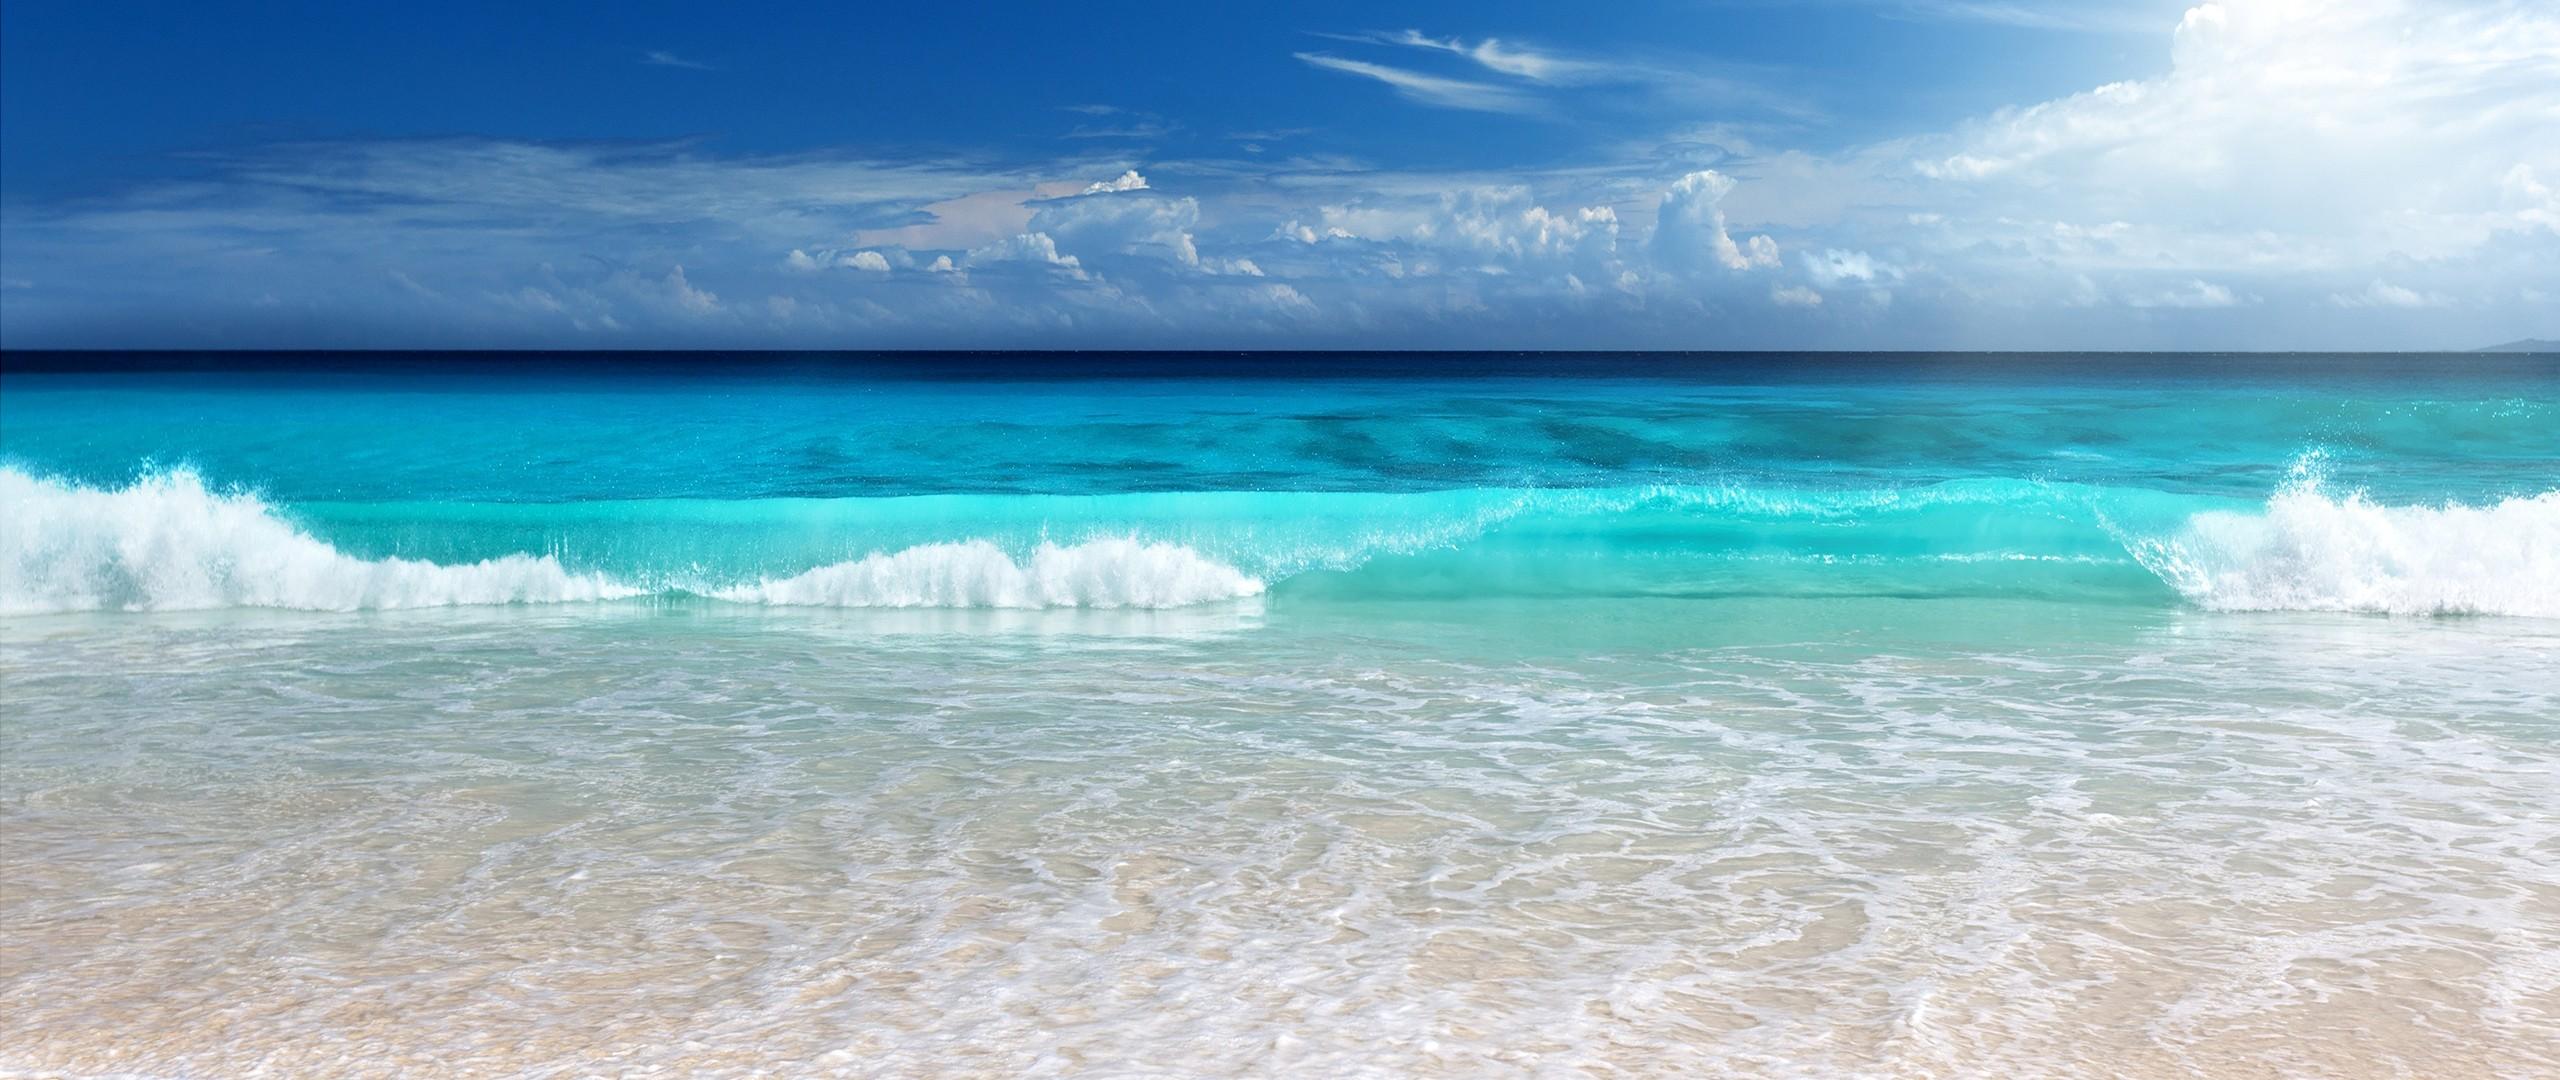 Wallpaper Sea Nature Shore Photography Beach Coast Horizon 2560x1080 Ultra